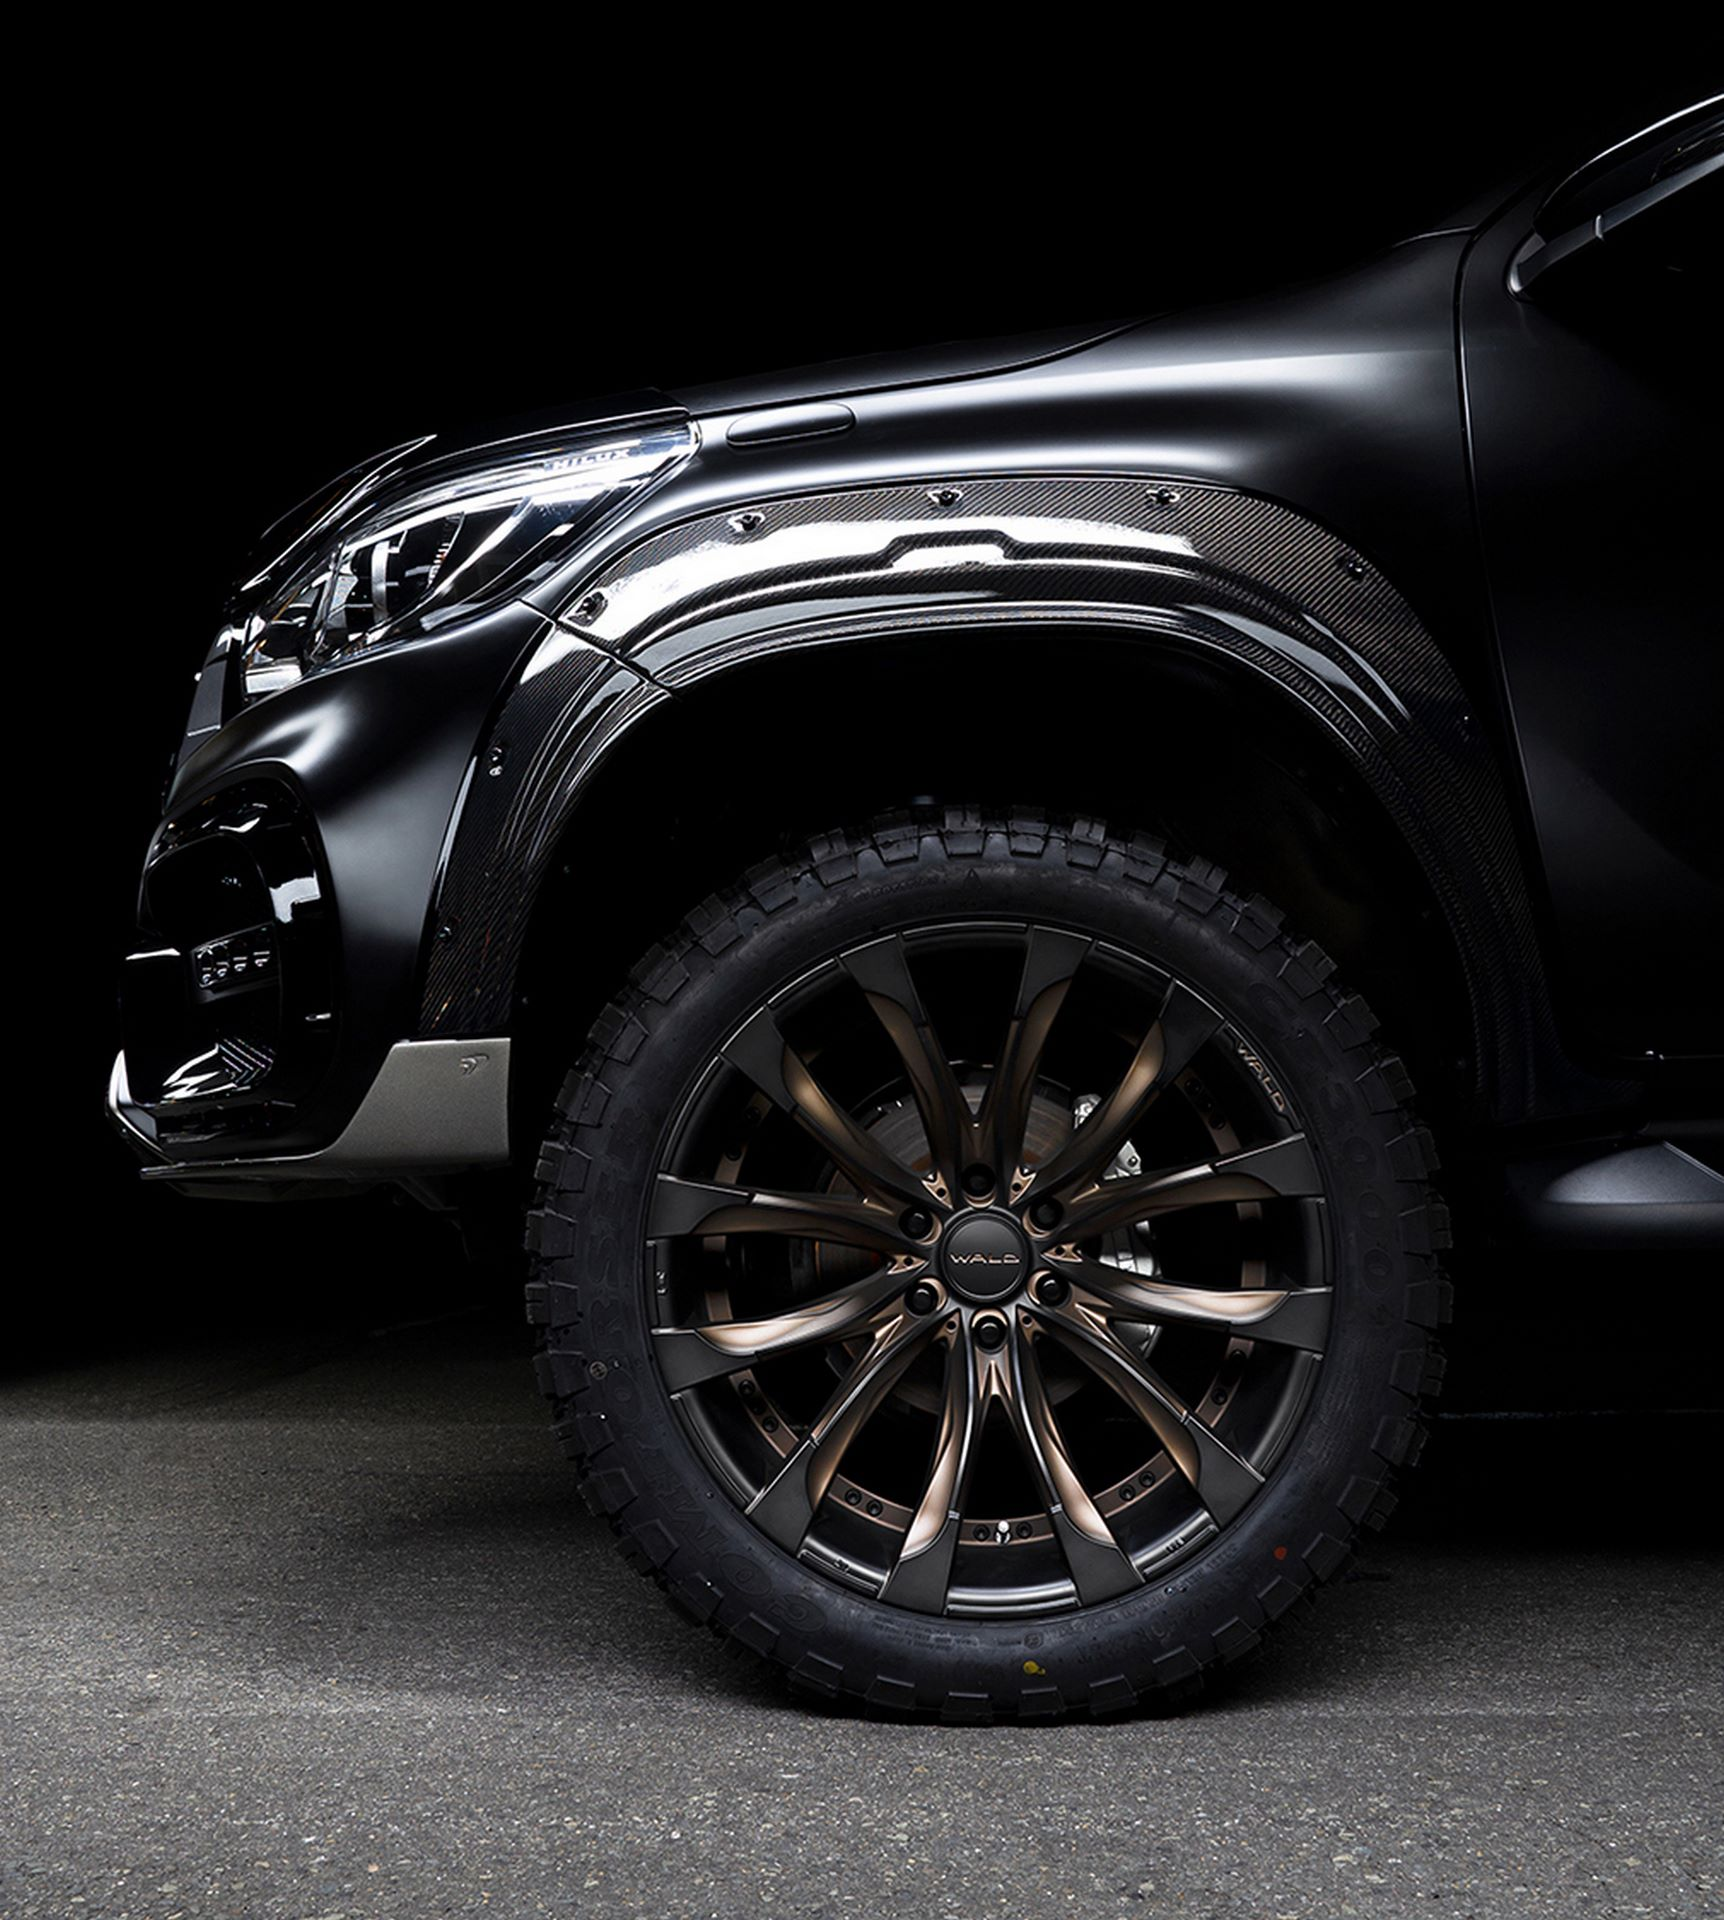 Toyota-Hilux-Black-Bison-by-Wald-International-9